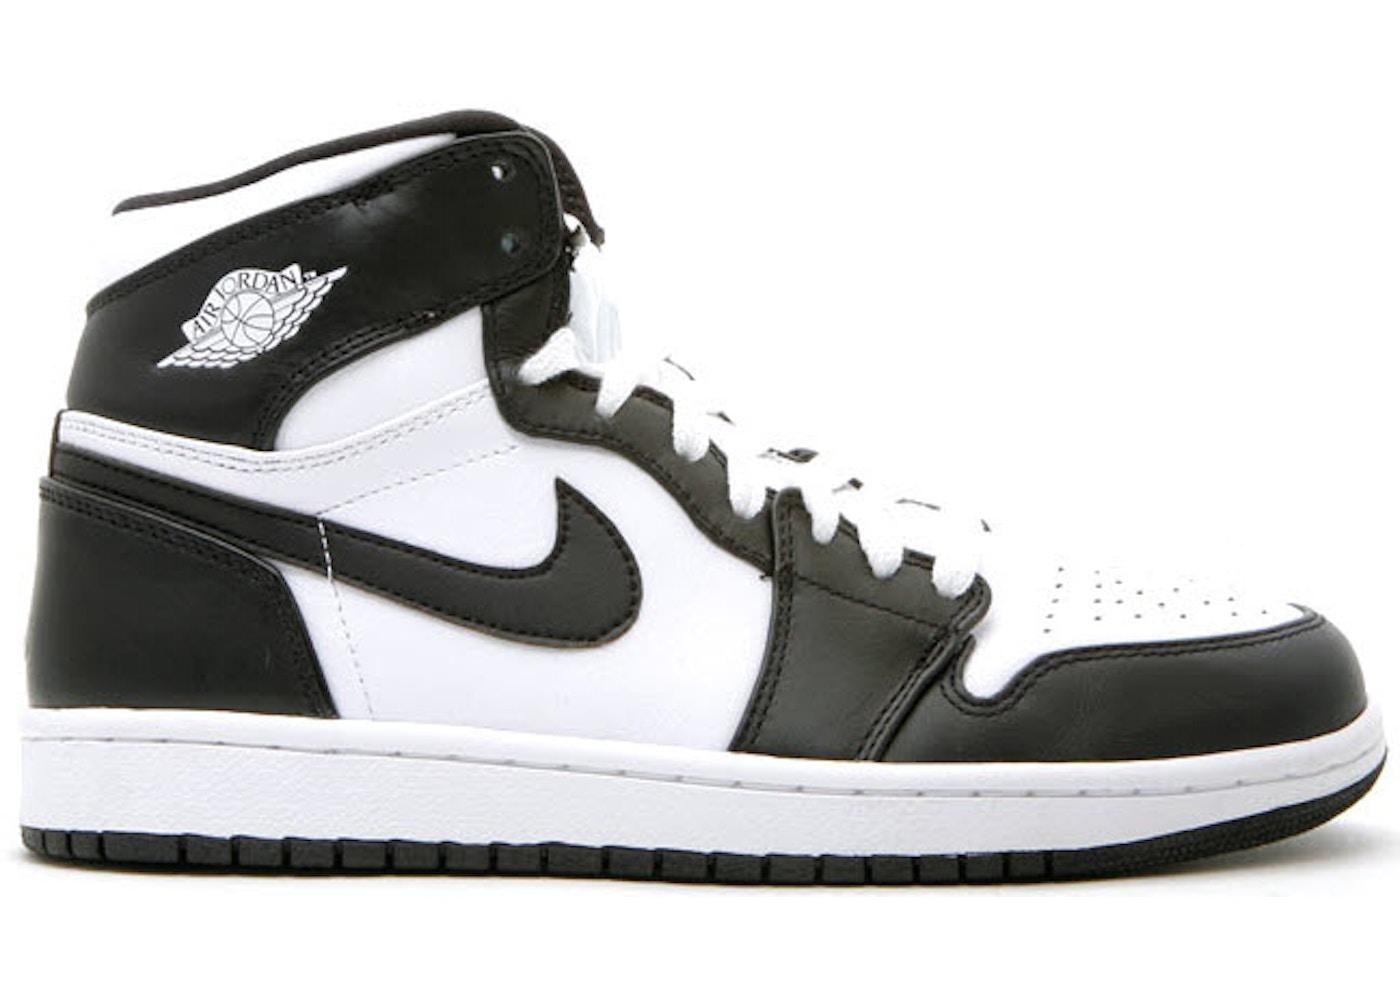 buy online da6ba 10928 Jordan 1 Retro White Black CDP (2008) - 332550-011